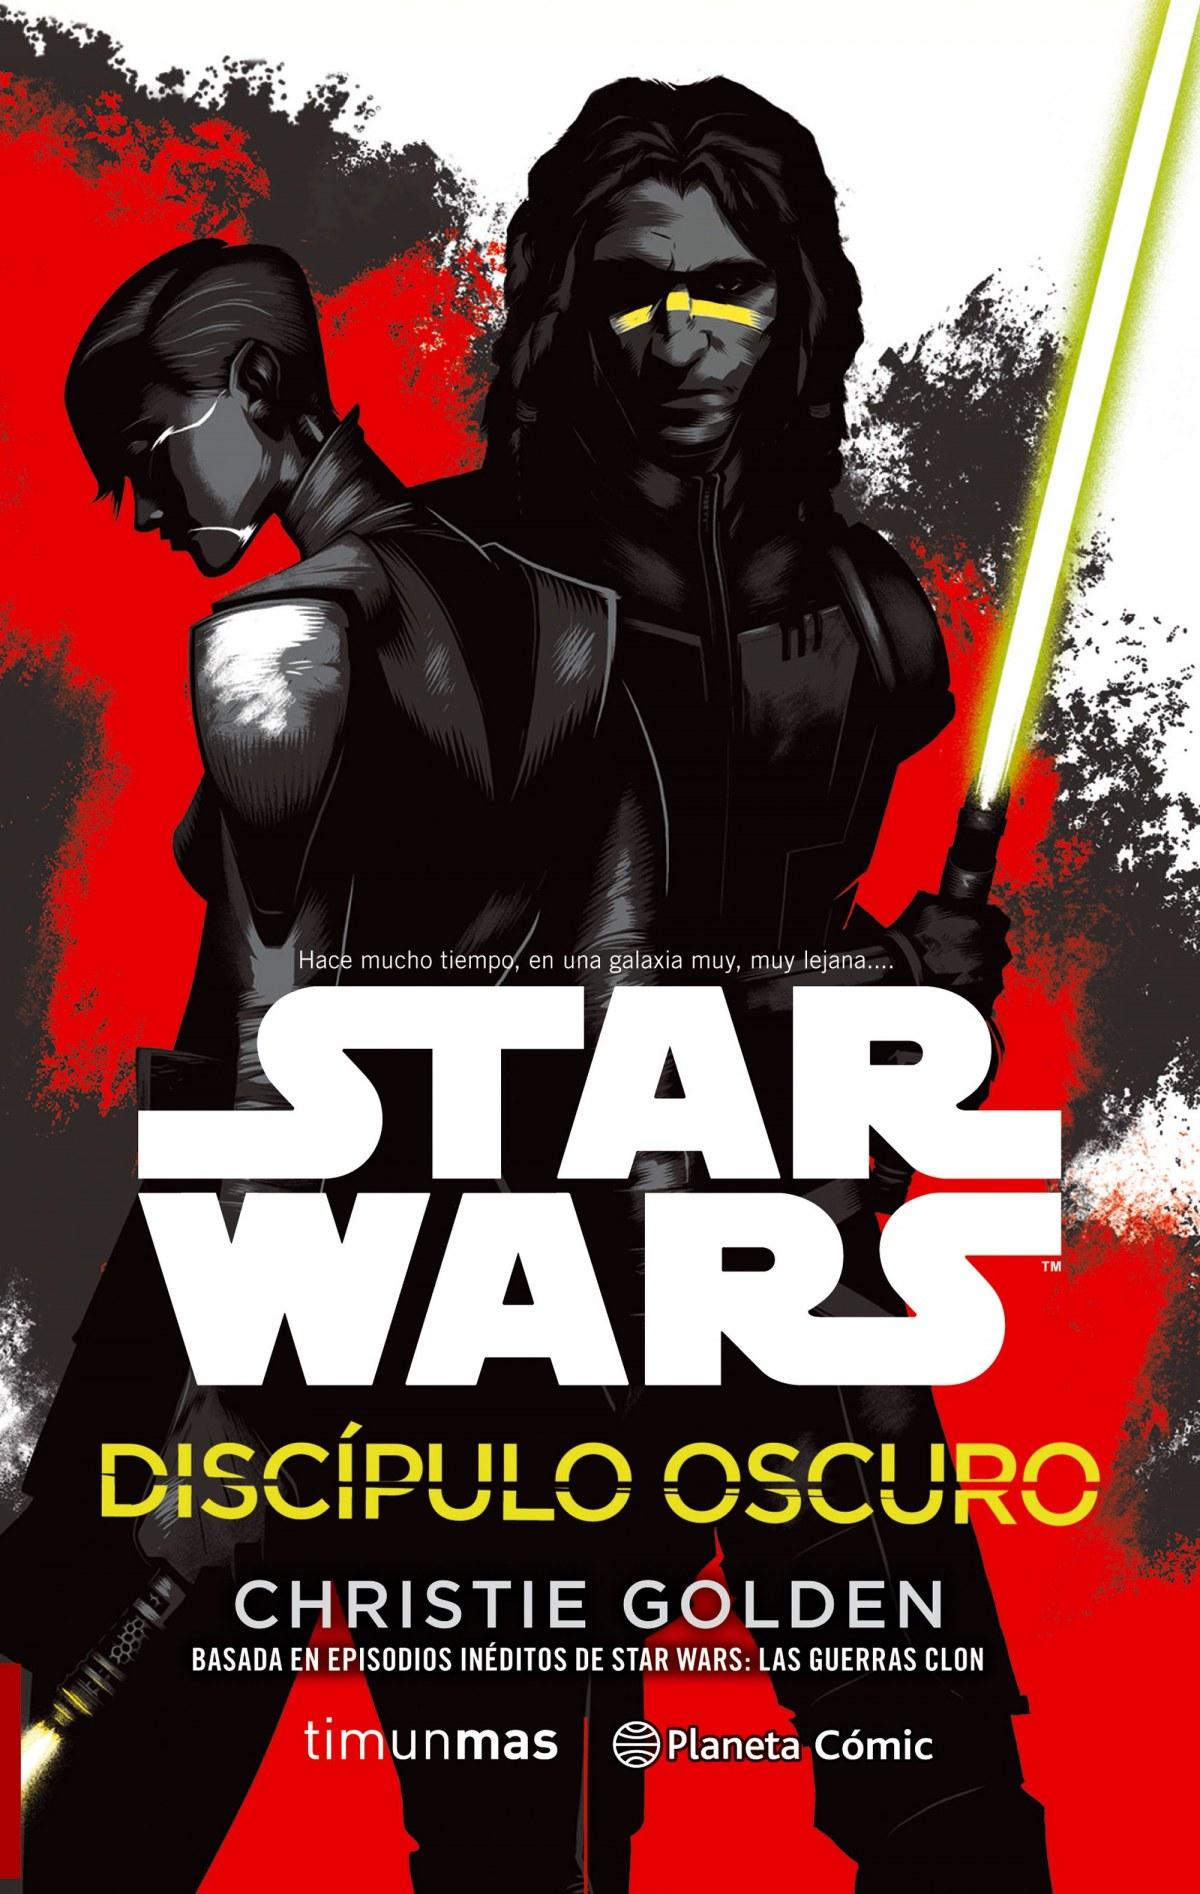 STAR WARS DISCÍPULO OSCURO